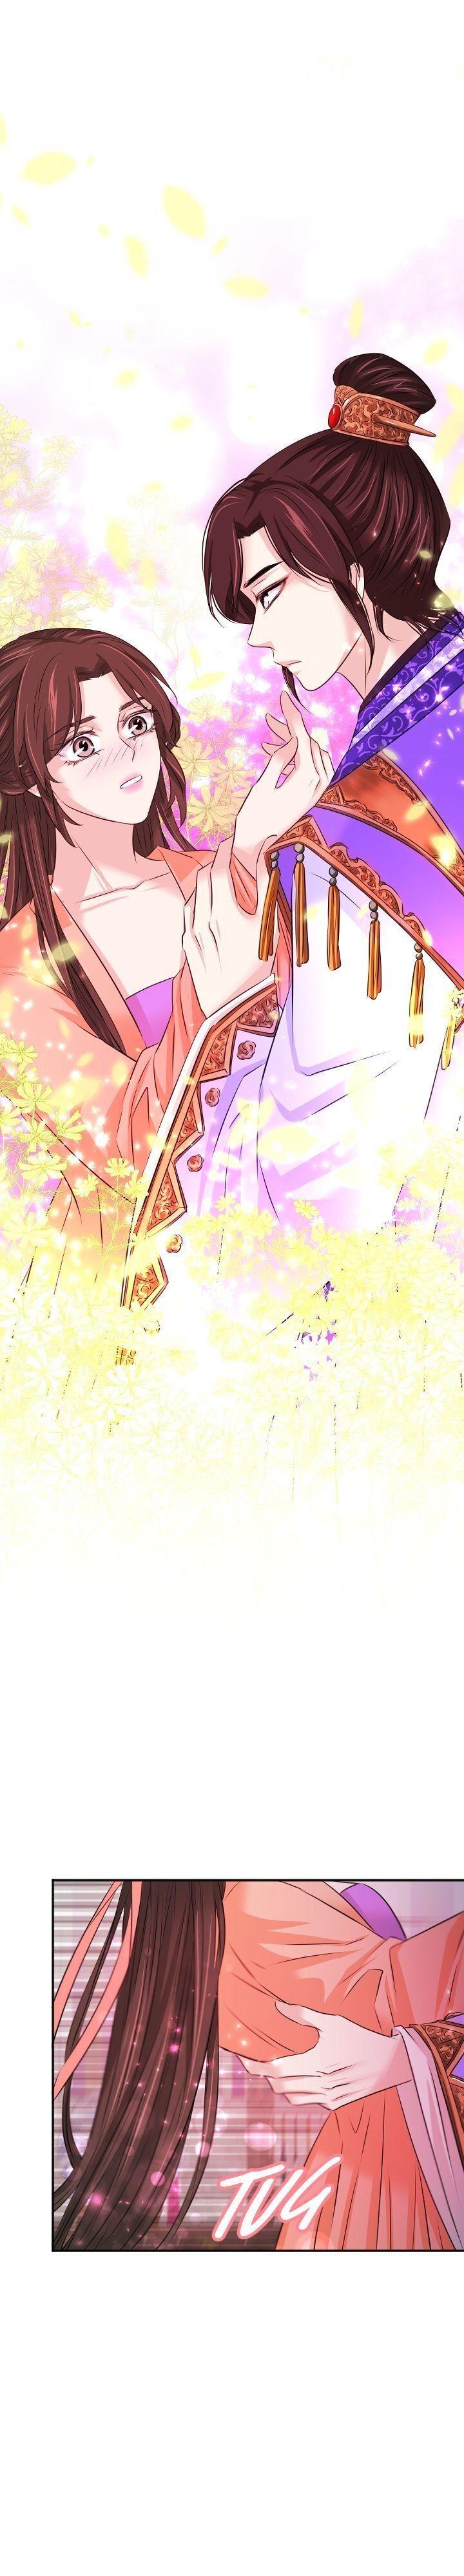 An Inescapable Love Chapter 48 page 7 - Mangakakalots.com